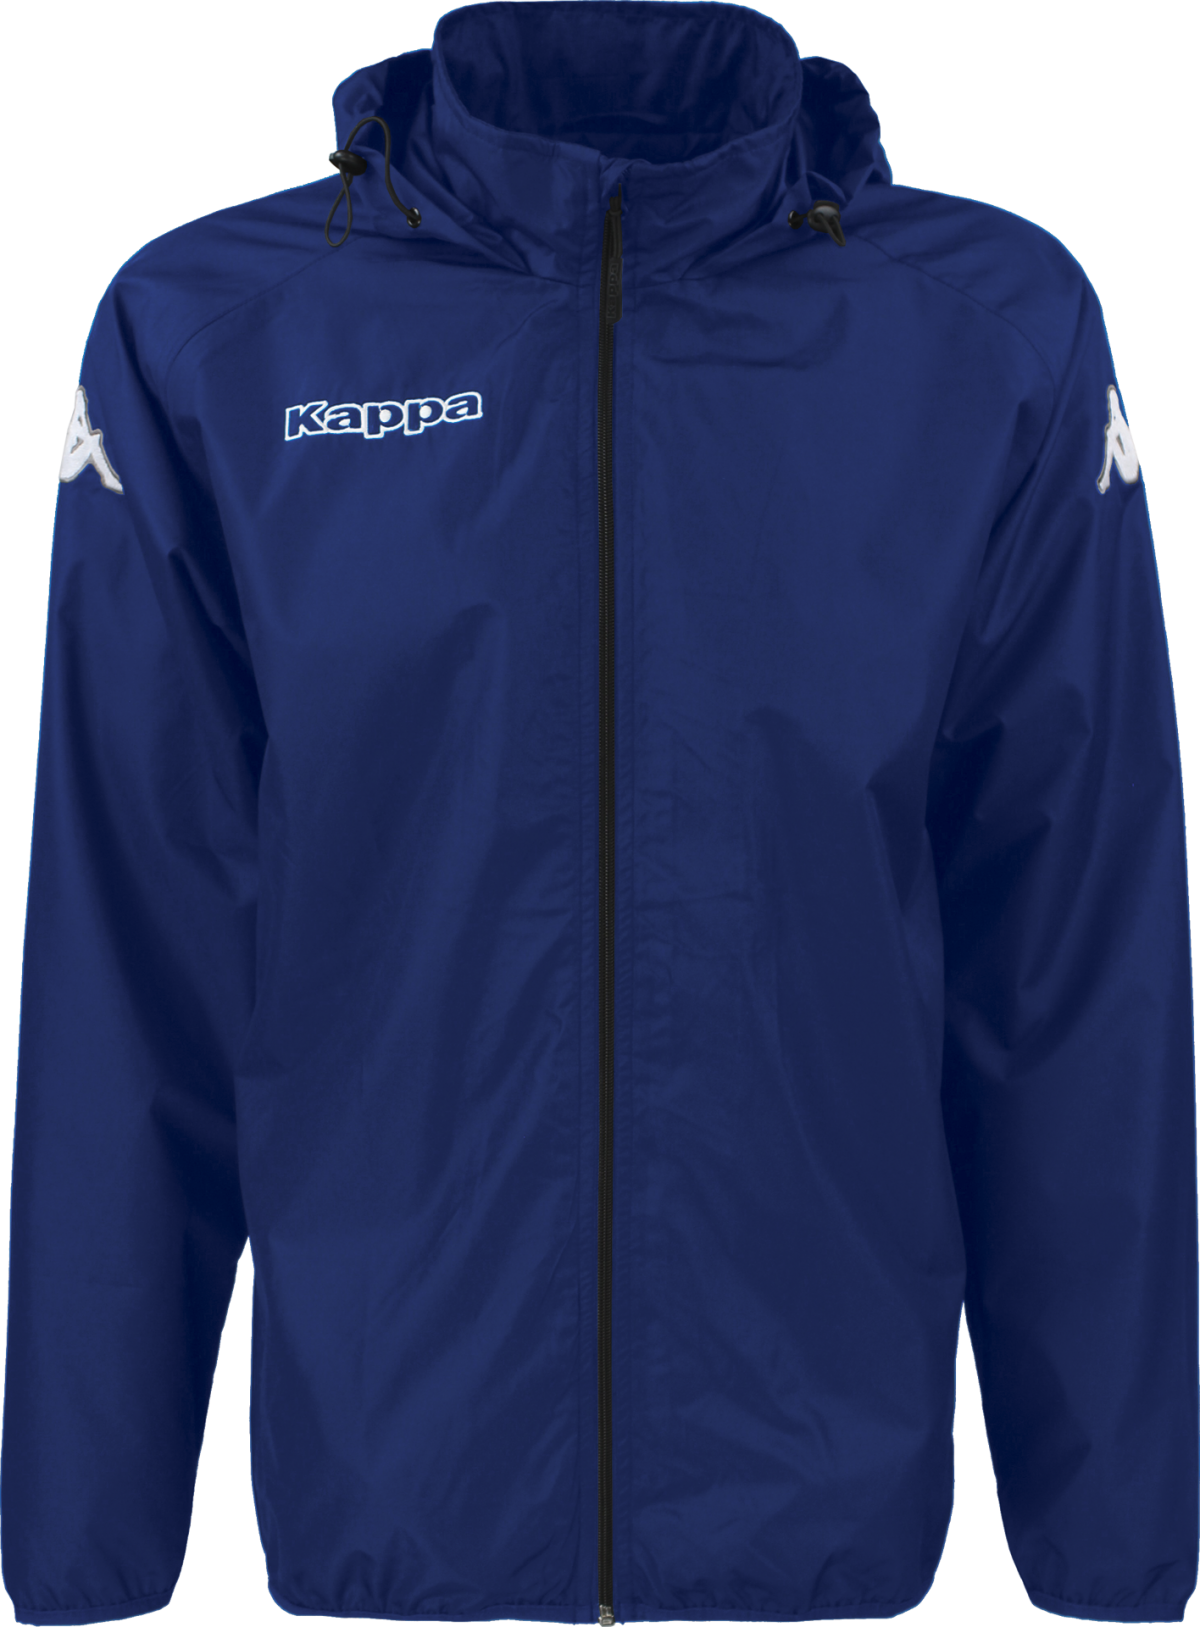 Martio Windbreaker Jacket 304TSPO 914 ADULT FC Fresno Academy